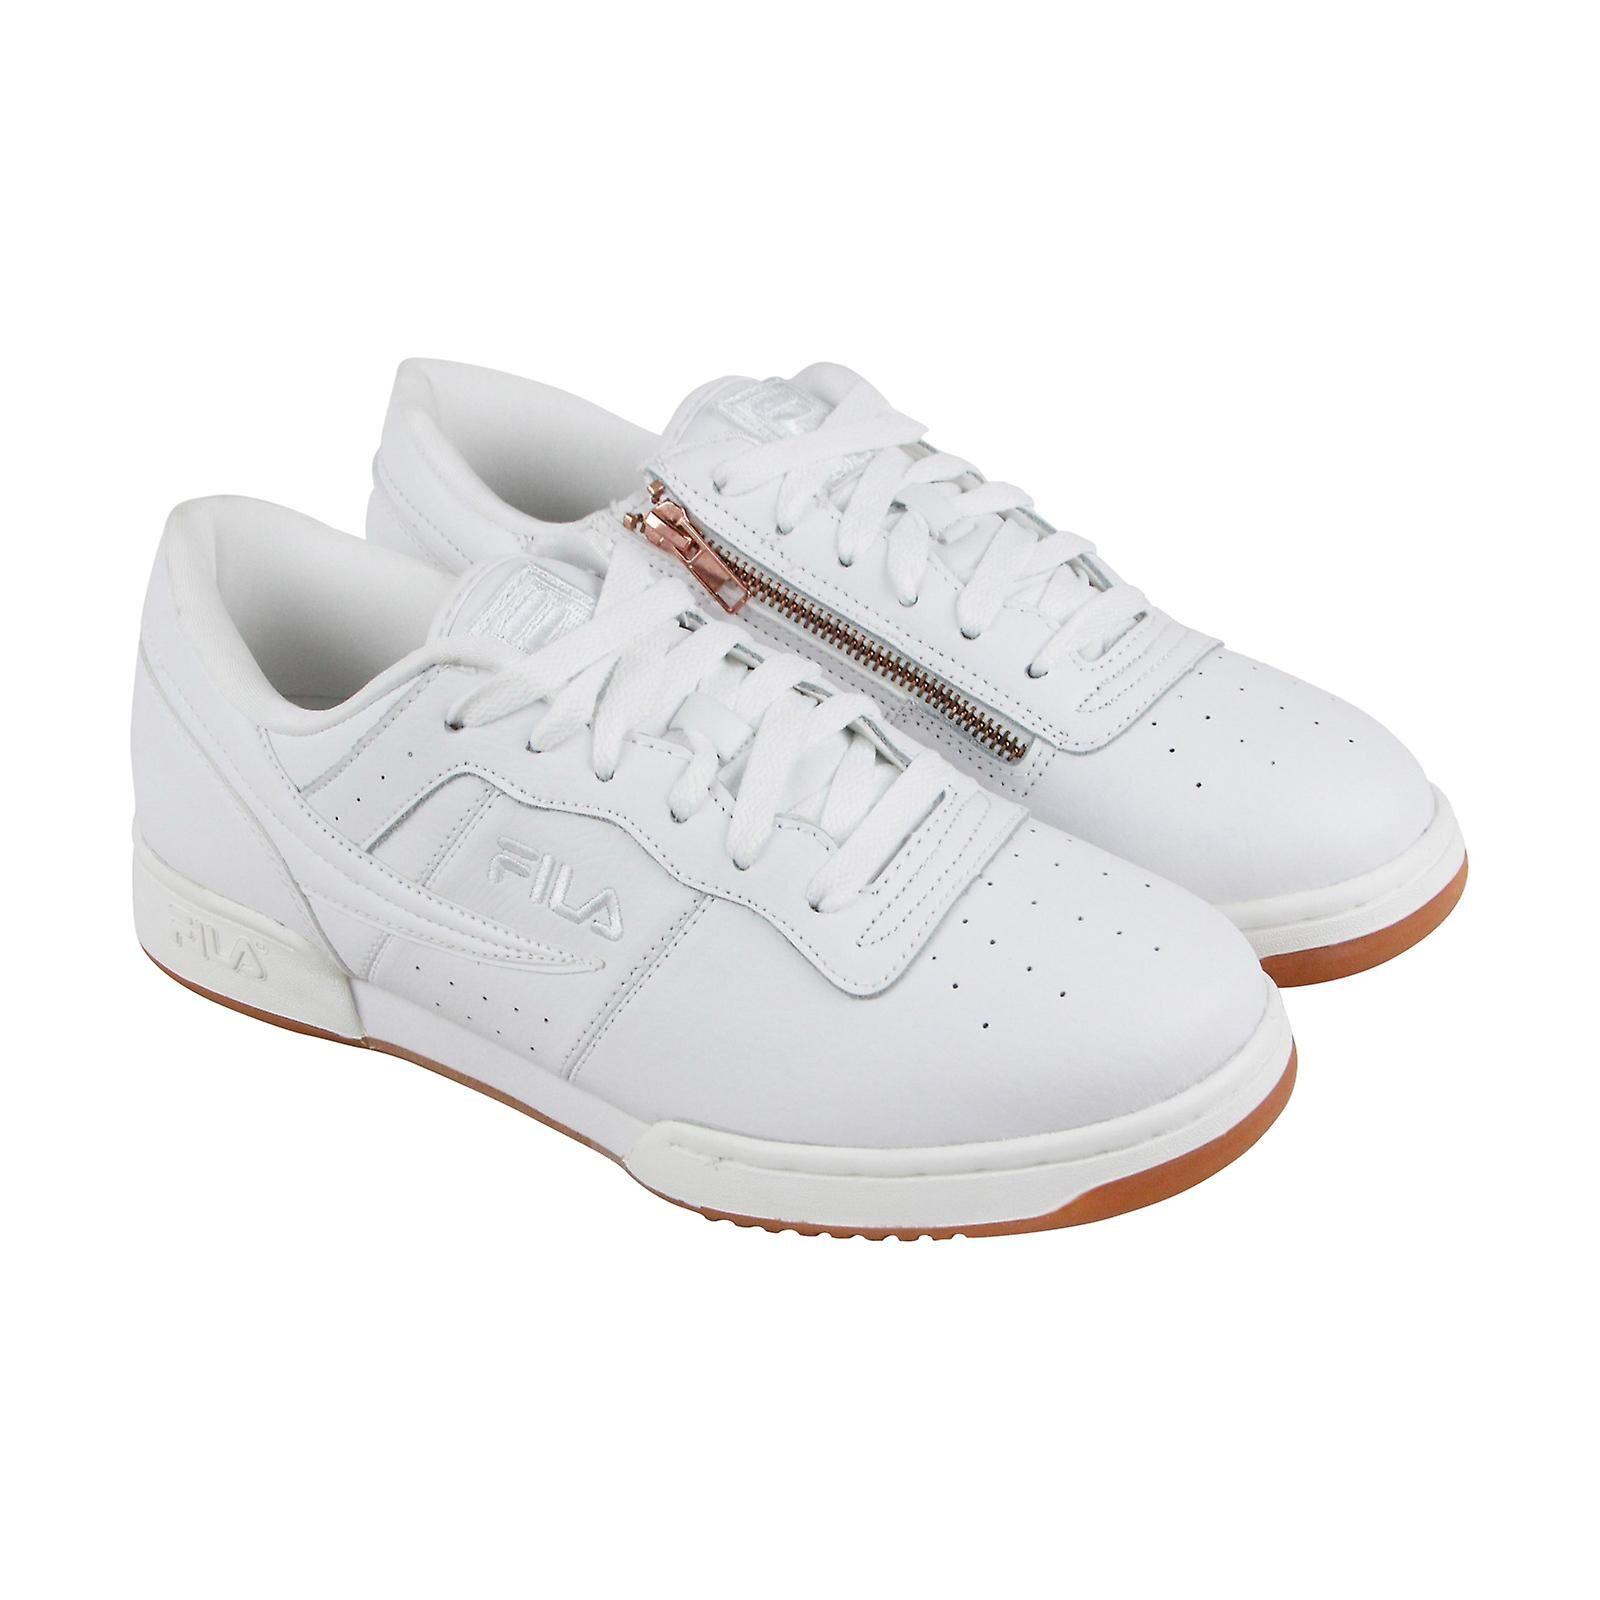 Fila Chaussures Fila Original Fitness Zipper Mens White Leather Casual L...